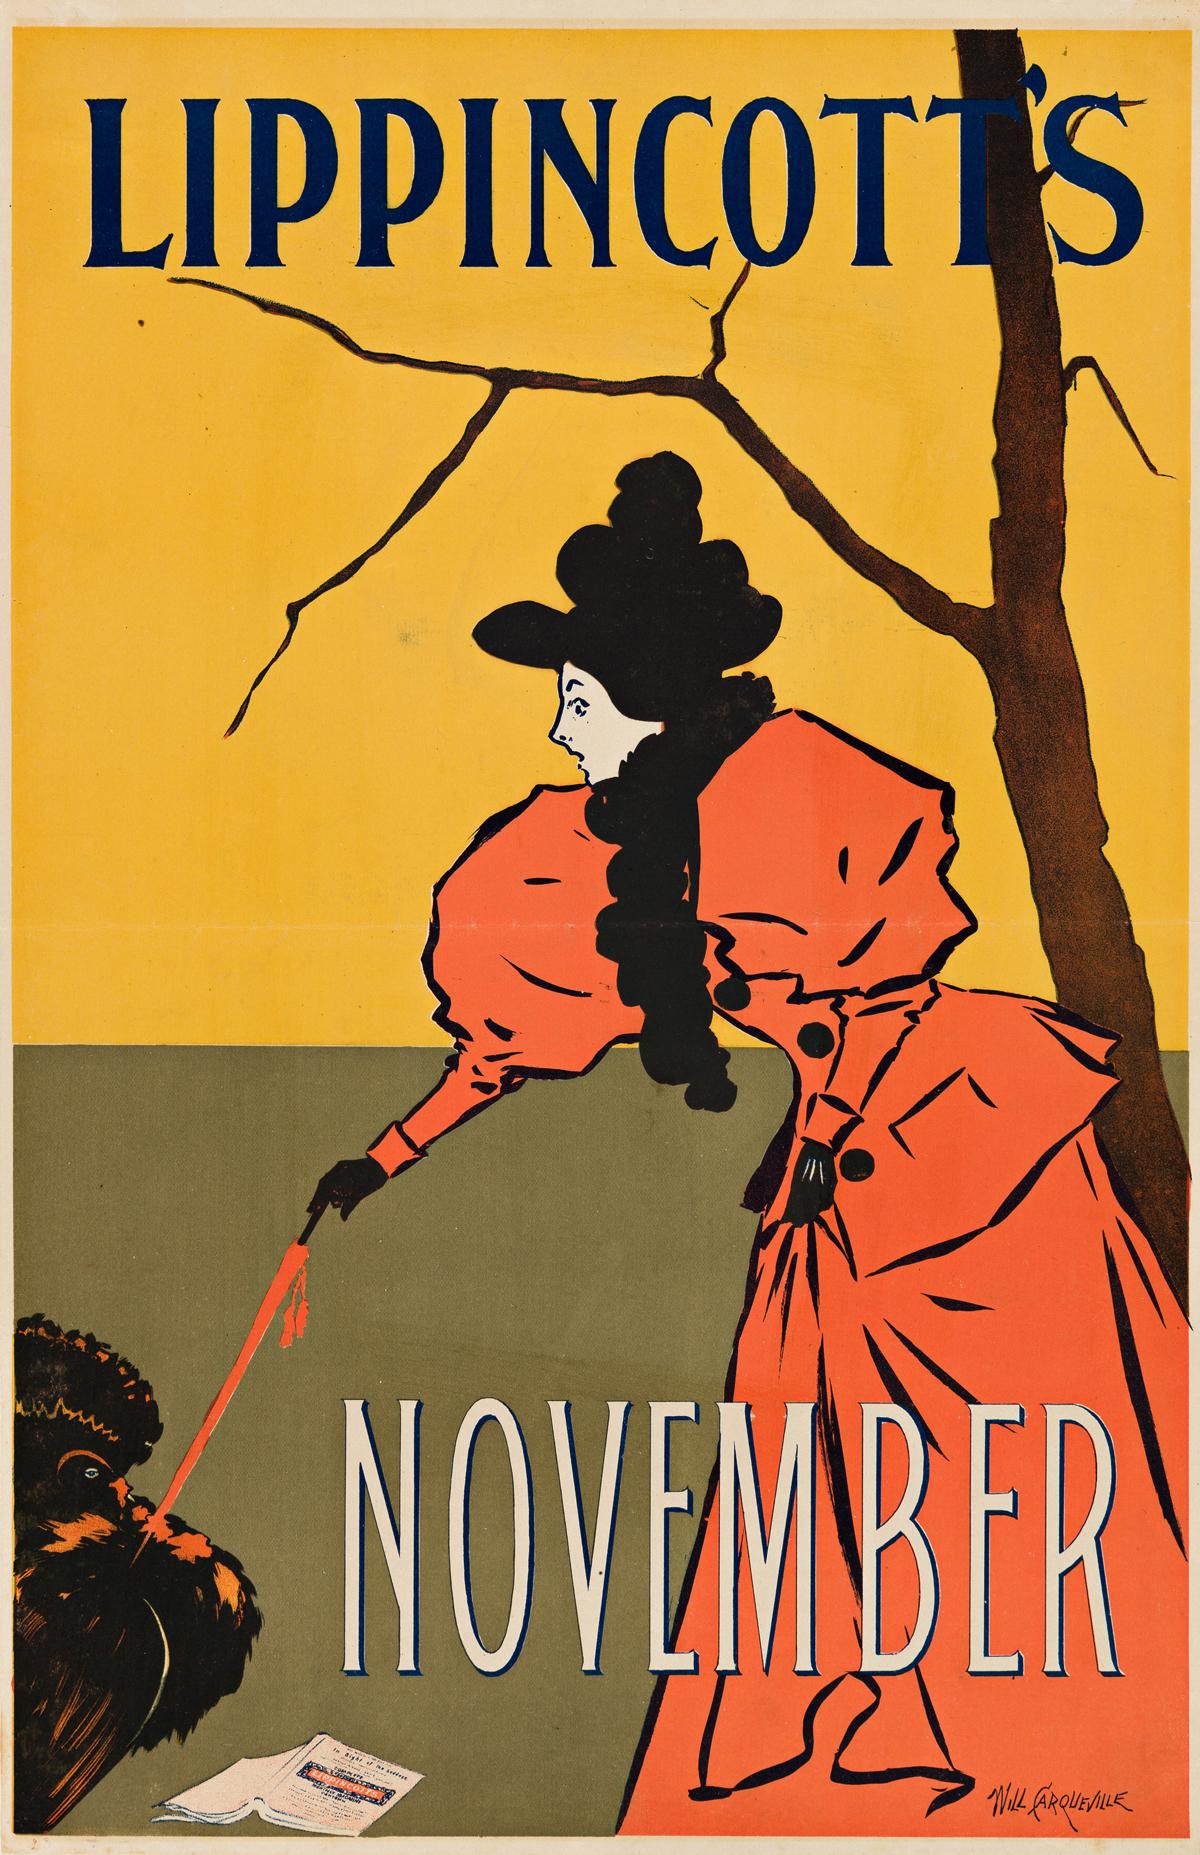 WILL CARQUEVILLE (1871-1946).  LIPPINCOTTS NOVEMBER. 1895. 18x12 inches, 47x31 cm.